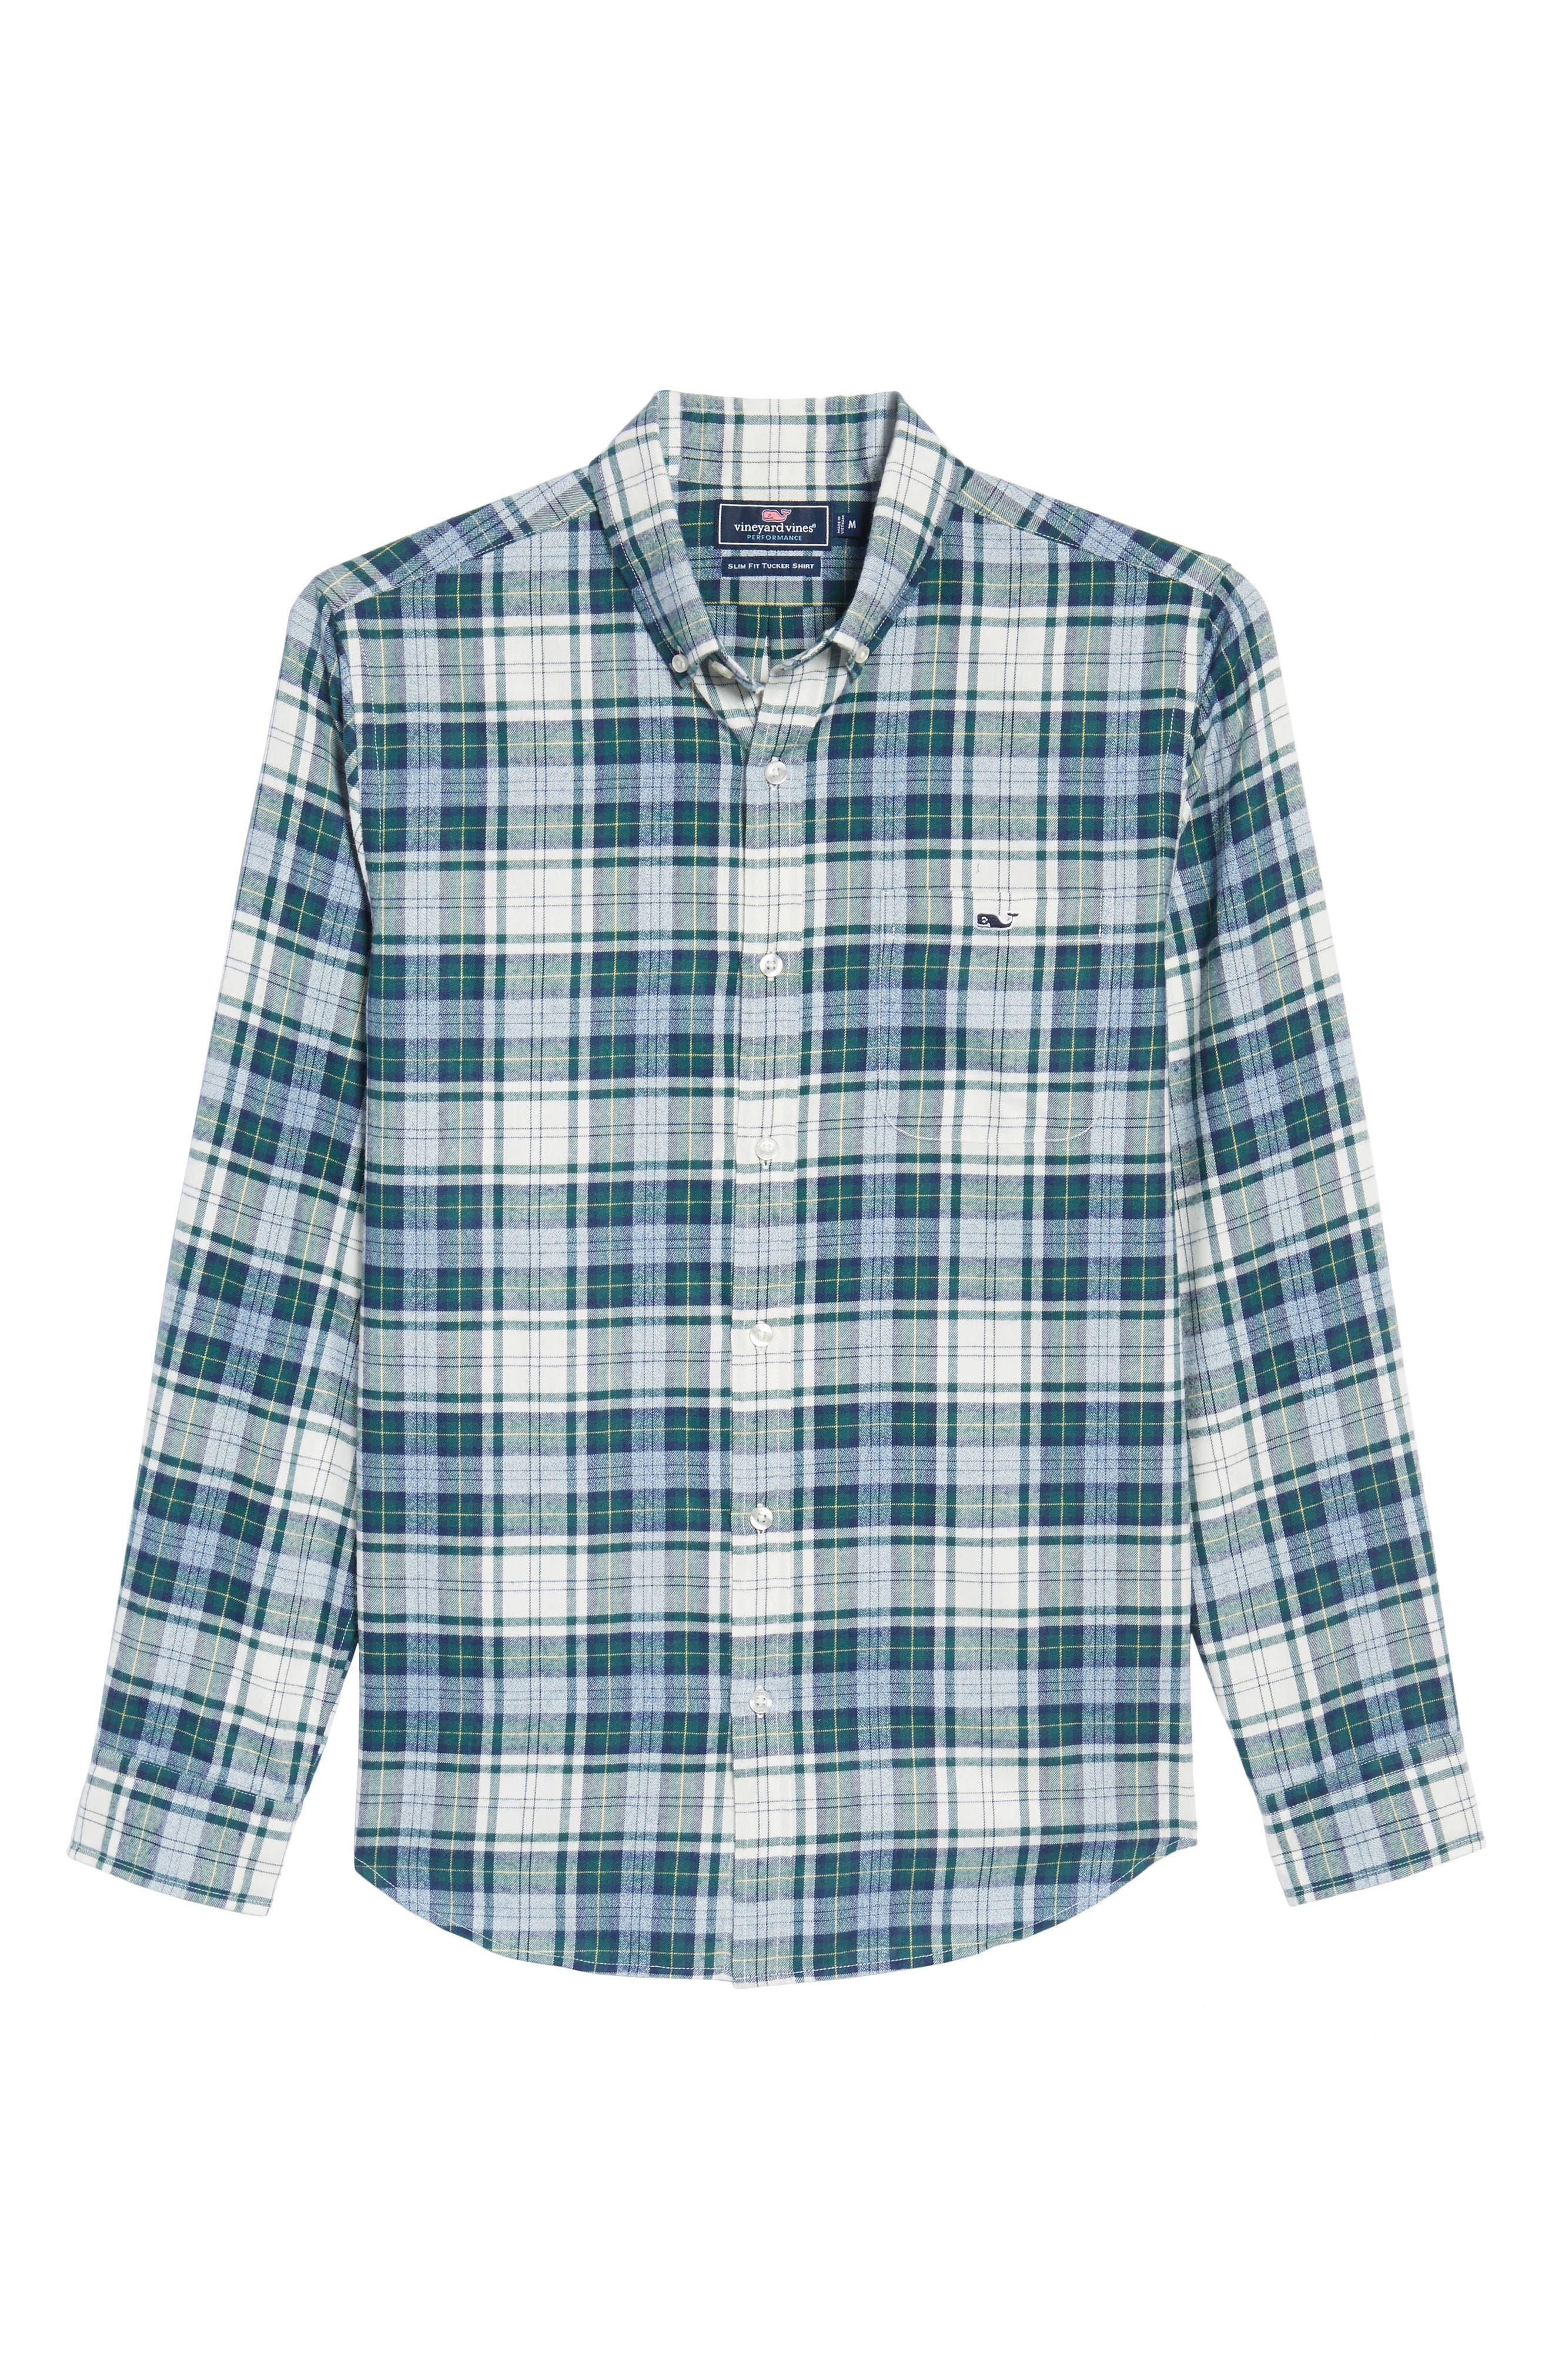 Tucker Hayward Point Slim Fit Plaid Sport Shirt,                             Alternate thumbnail 6, color,                             342